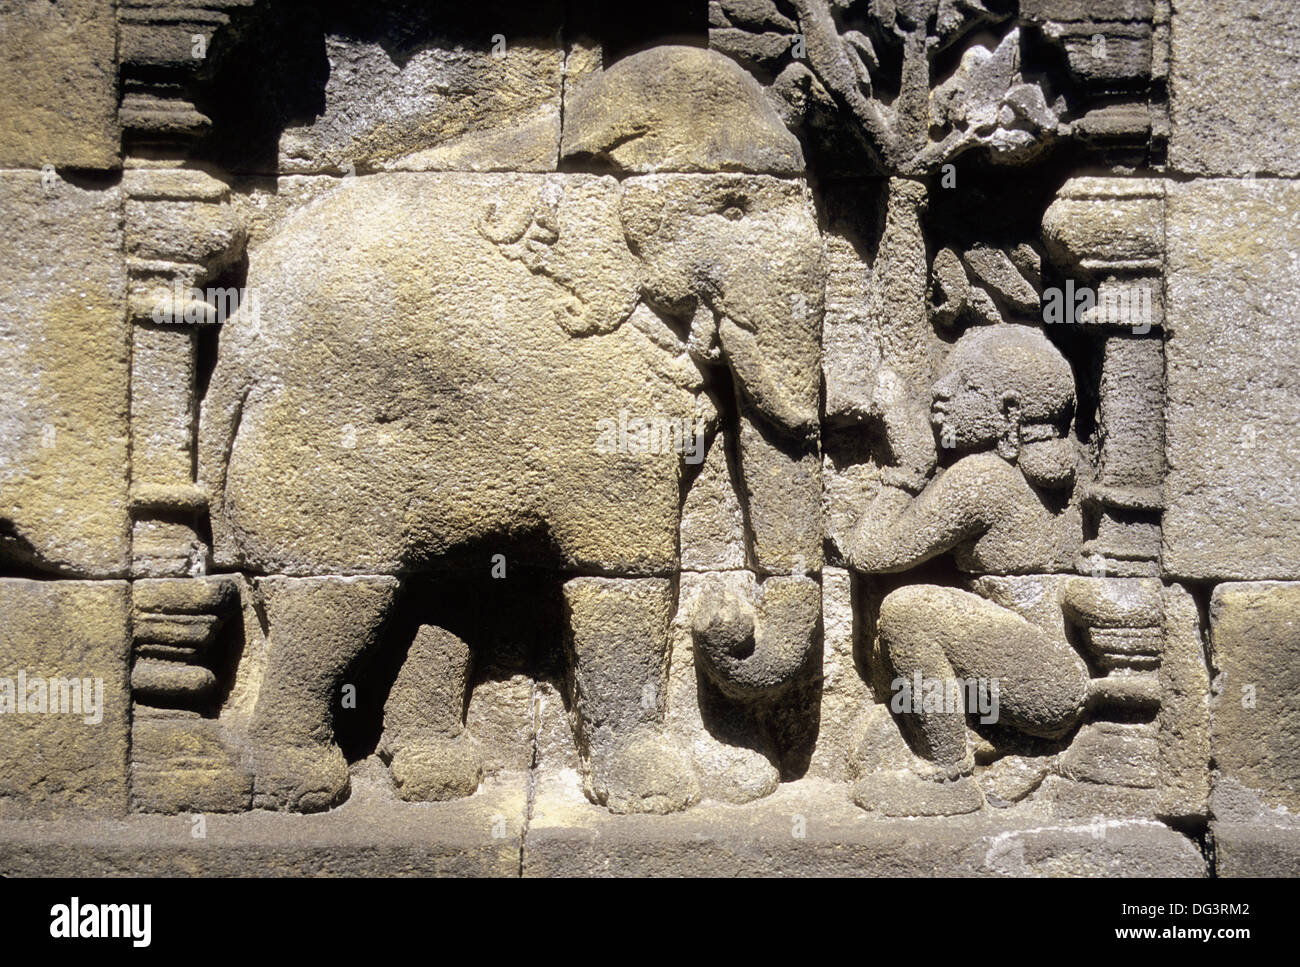 Elephant carvings stock photos